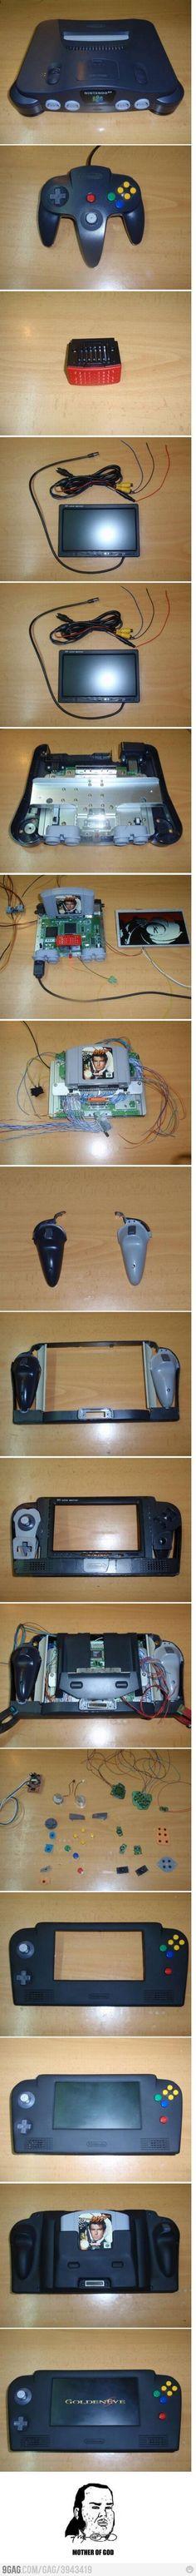 Construye tu propia Nintendo 64 Pocket...